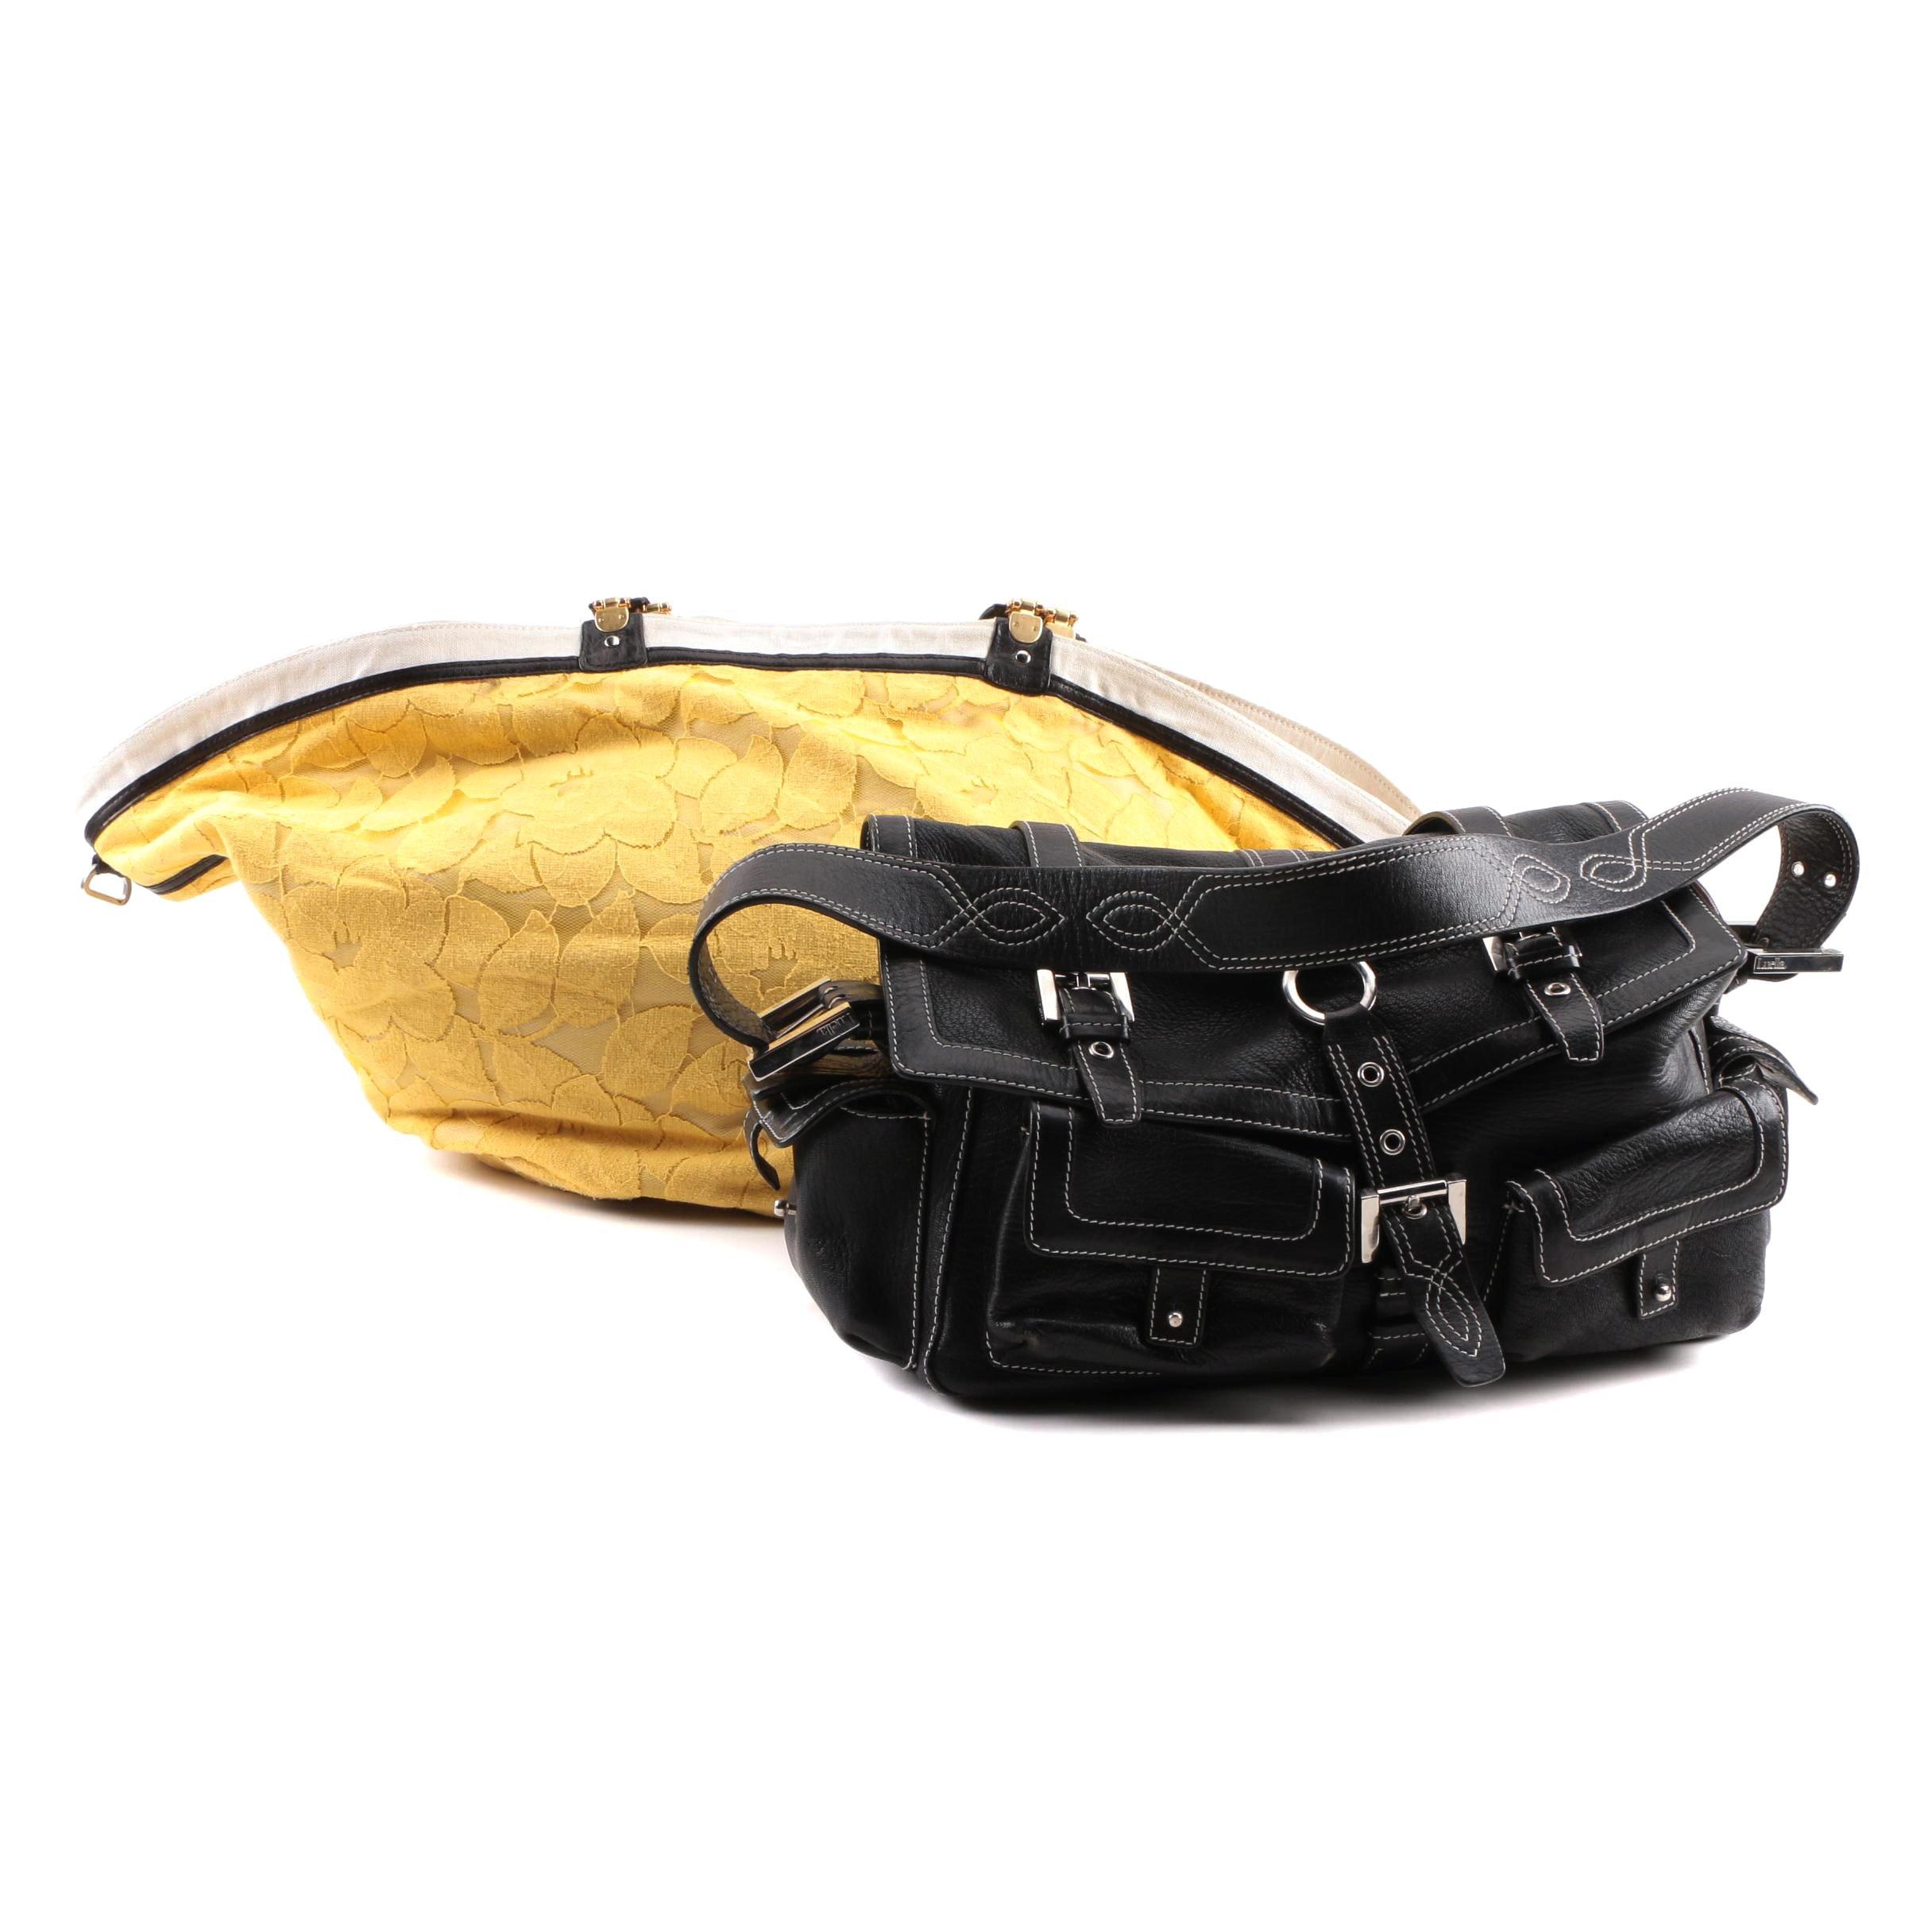 3.1 Phillip Lim Canvas Tote and Luella Leather Shoulder Bag